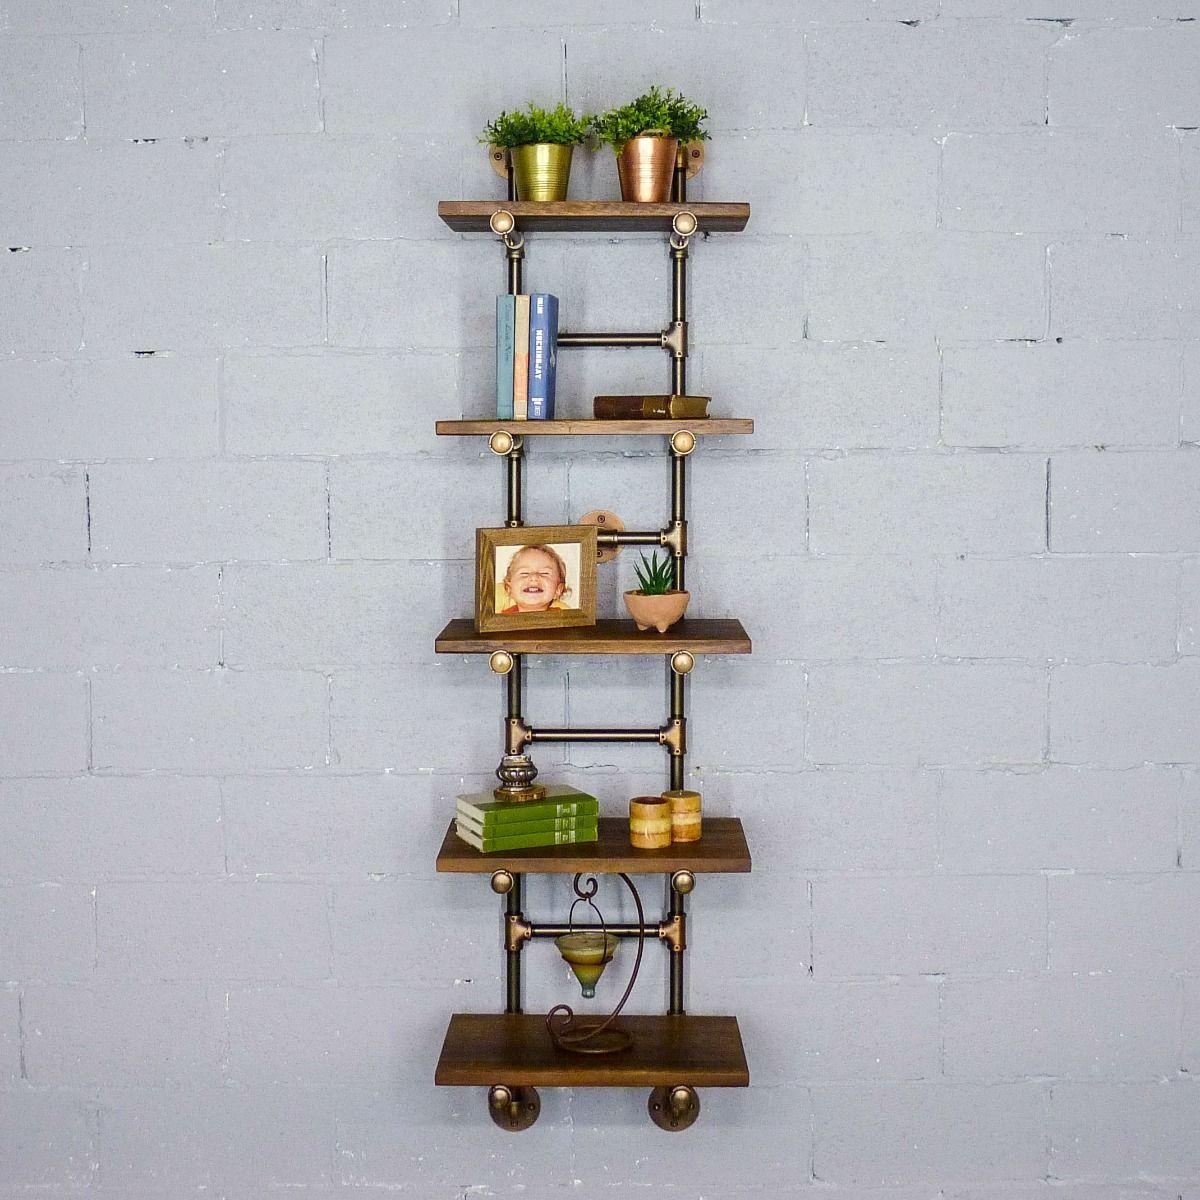 Phoenix Modern Industrial Ladder Wall Mounted Bookcase